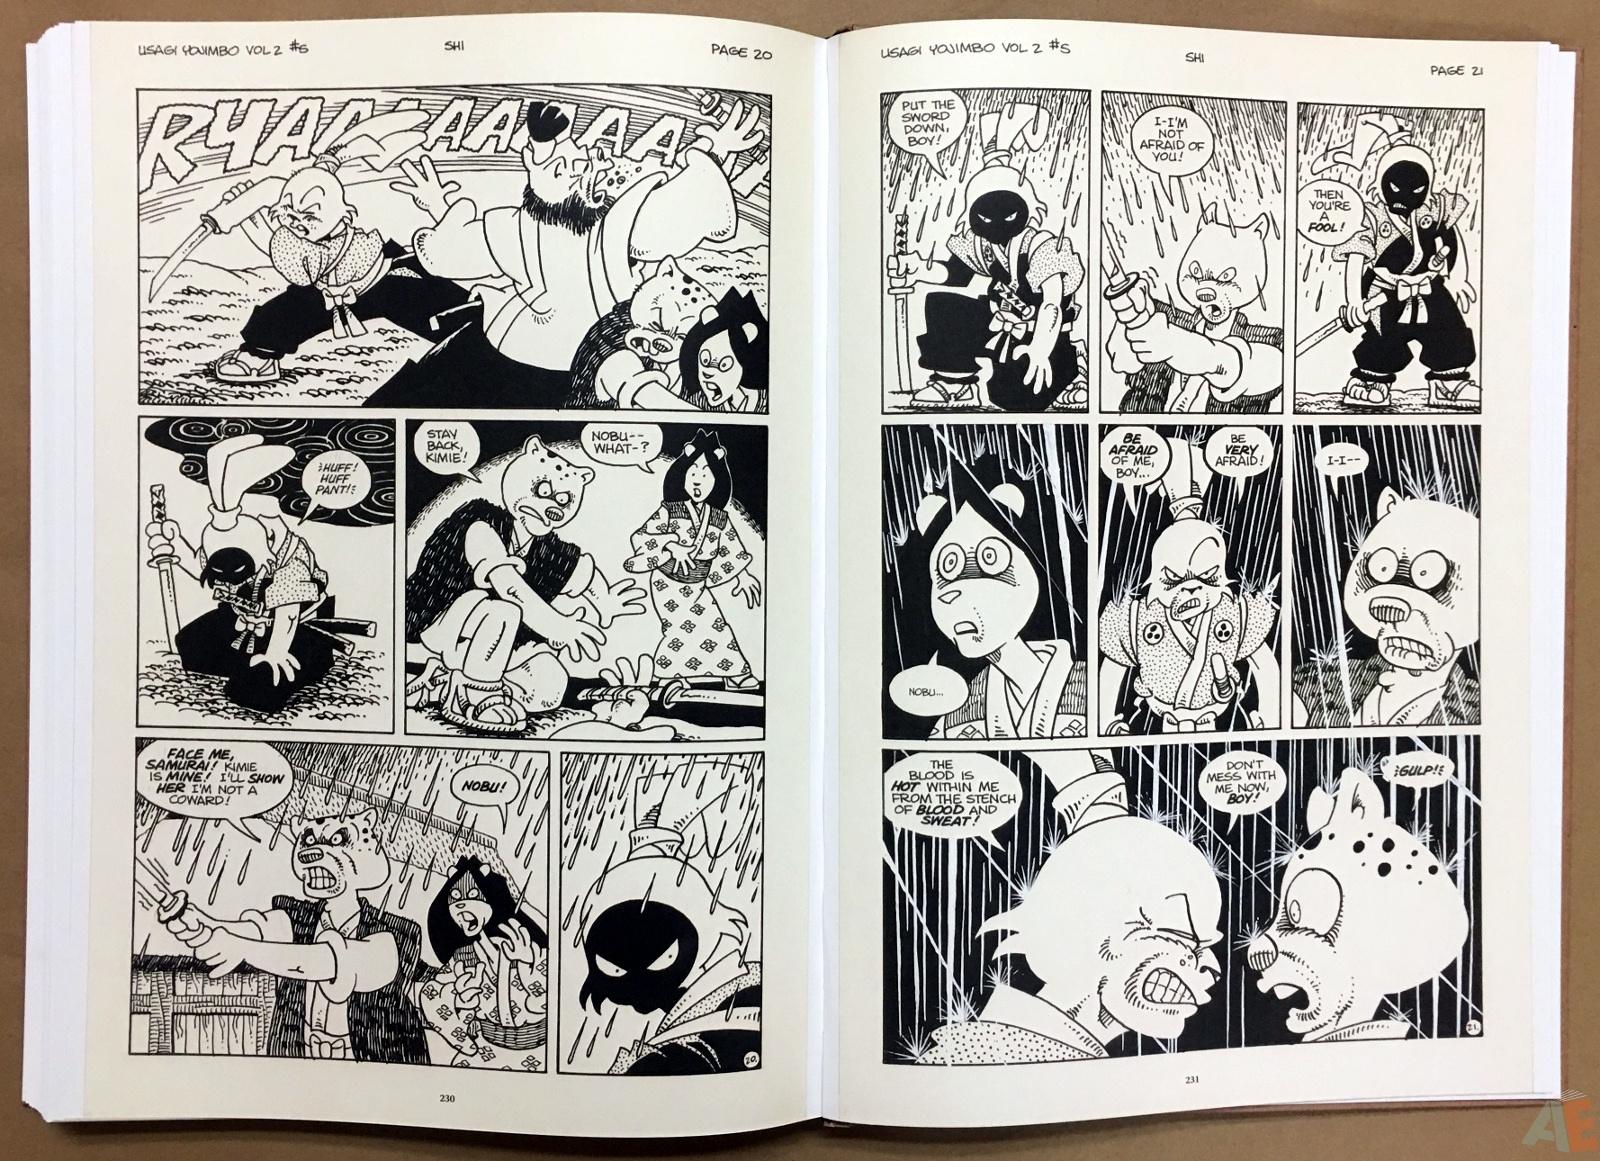 Usagi Yojimbo: Samurai and Other Stories Gallery Edition 40